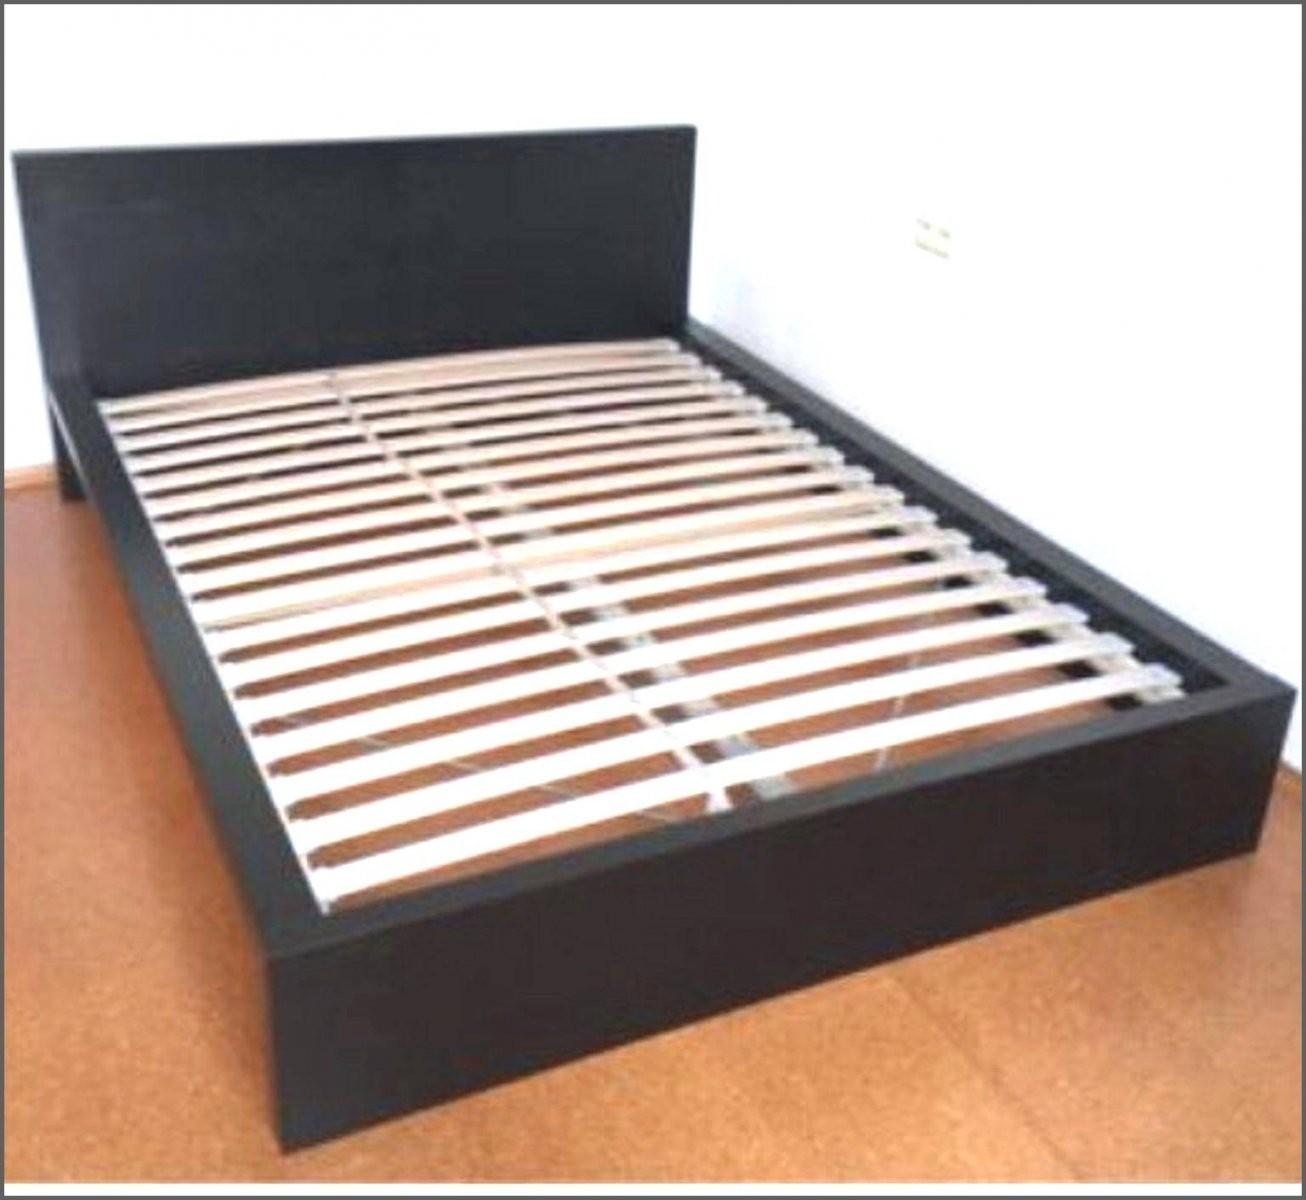 Ikea Malm Bett 140X200 Bauanleitung Archives  Die Idee Eines Bettes von Ikea Malm Bett 140X200 Anleitung Photo